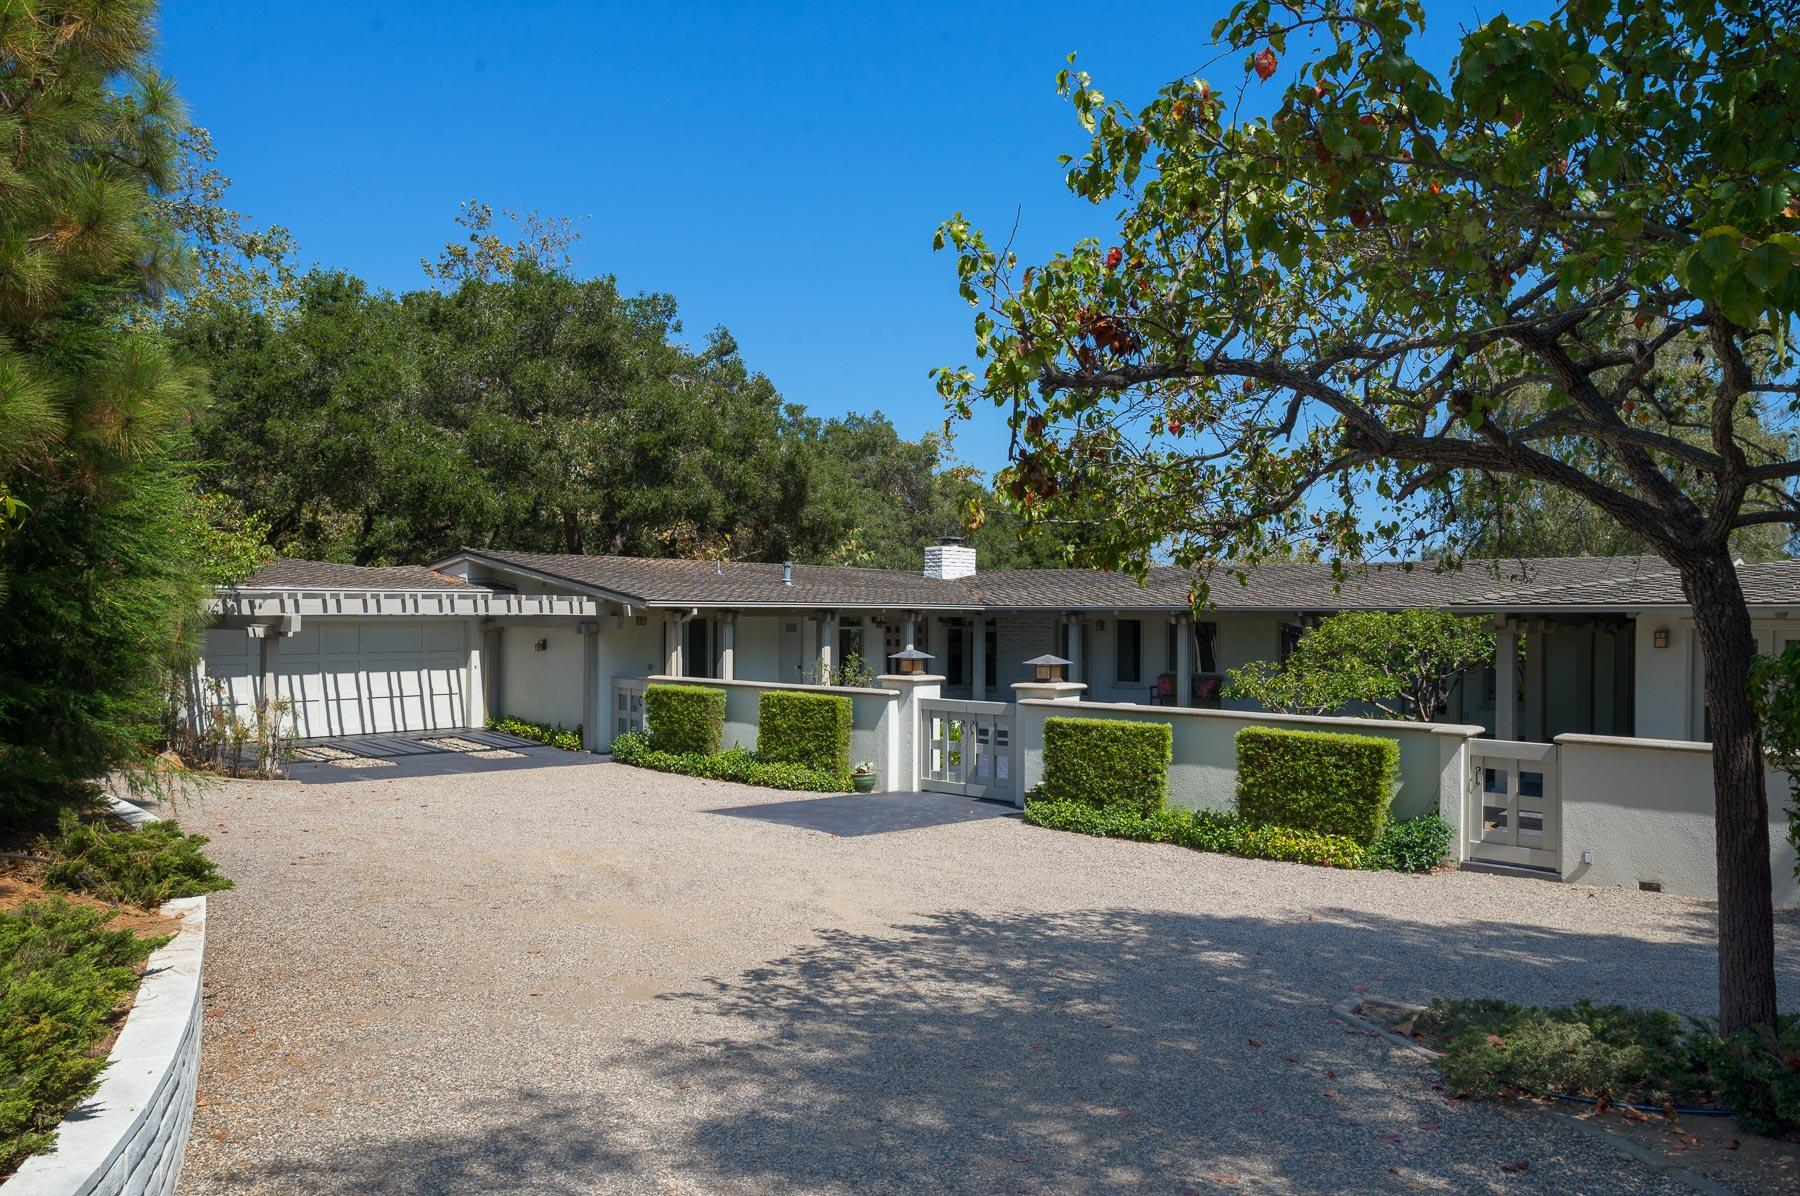 Property photo for 1211 East Valley Rd Santa Barbara, California 93108 - 15-2729